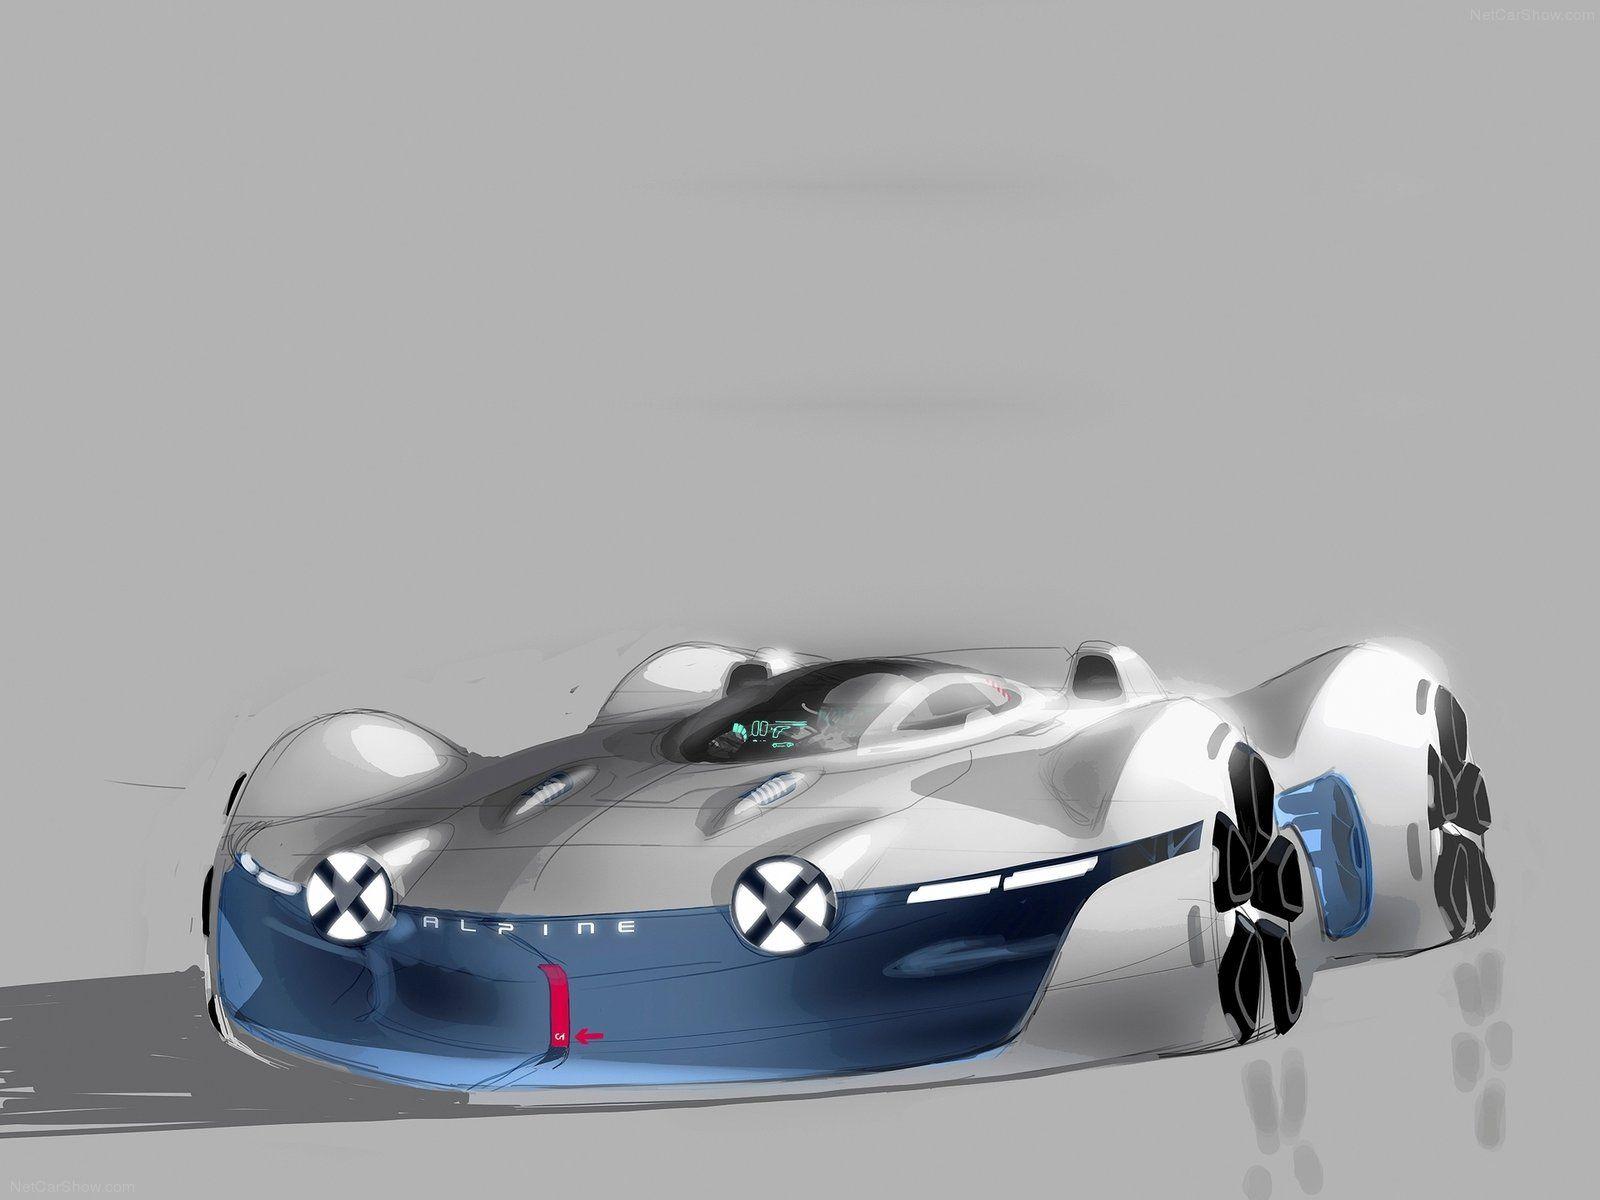 renault alpine vision gran turismo concept 2015 1600x1200 wallpaper 13 vehicle concept. Black Bedroom Furniture Sets. Home Design Ideas